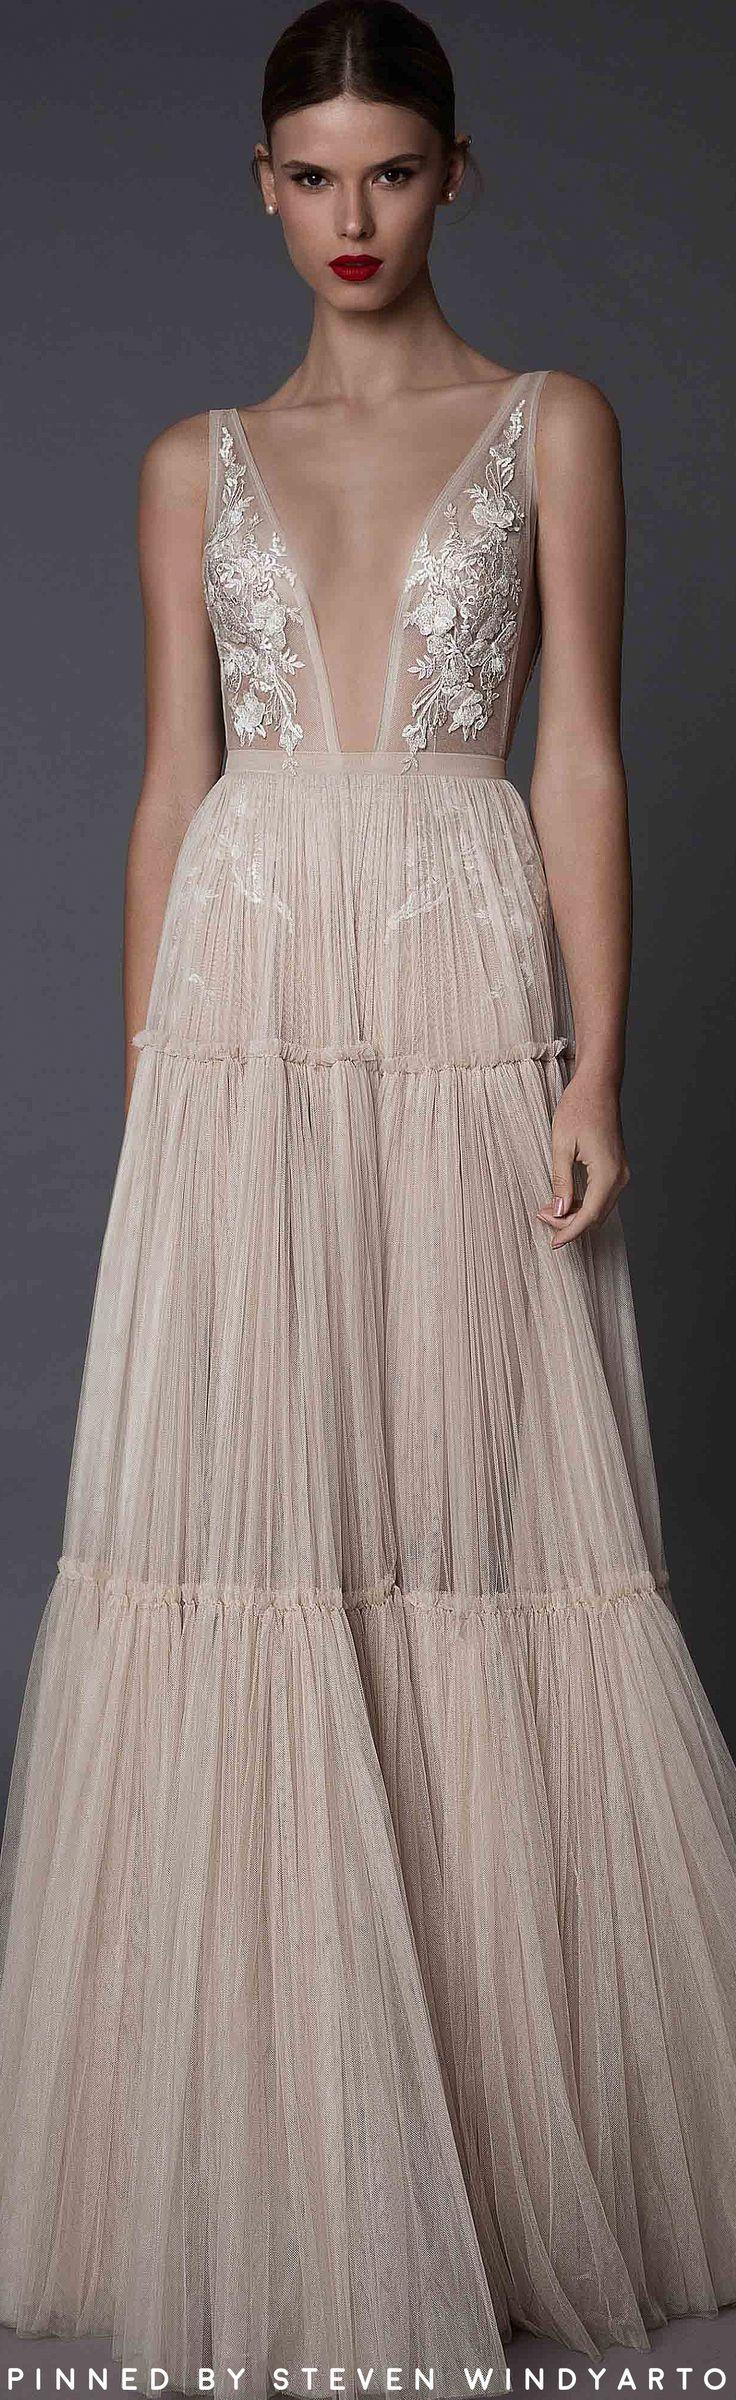 Berta Bridal Fall 2017 - Annabel Dress #weddingdress #fall2017 #fw17